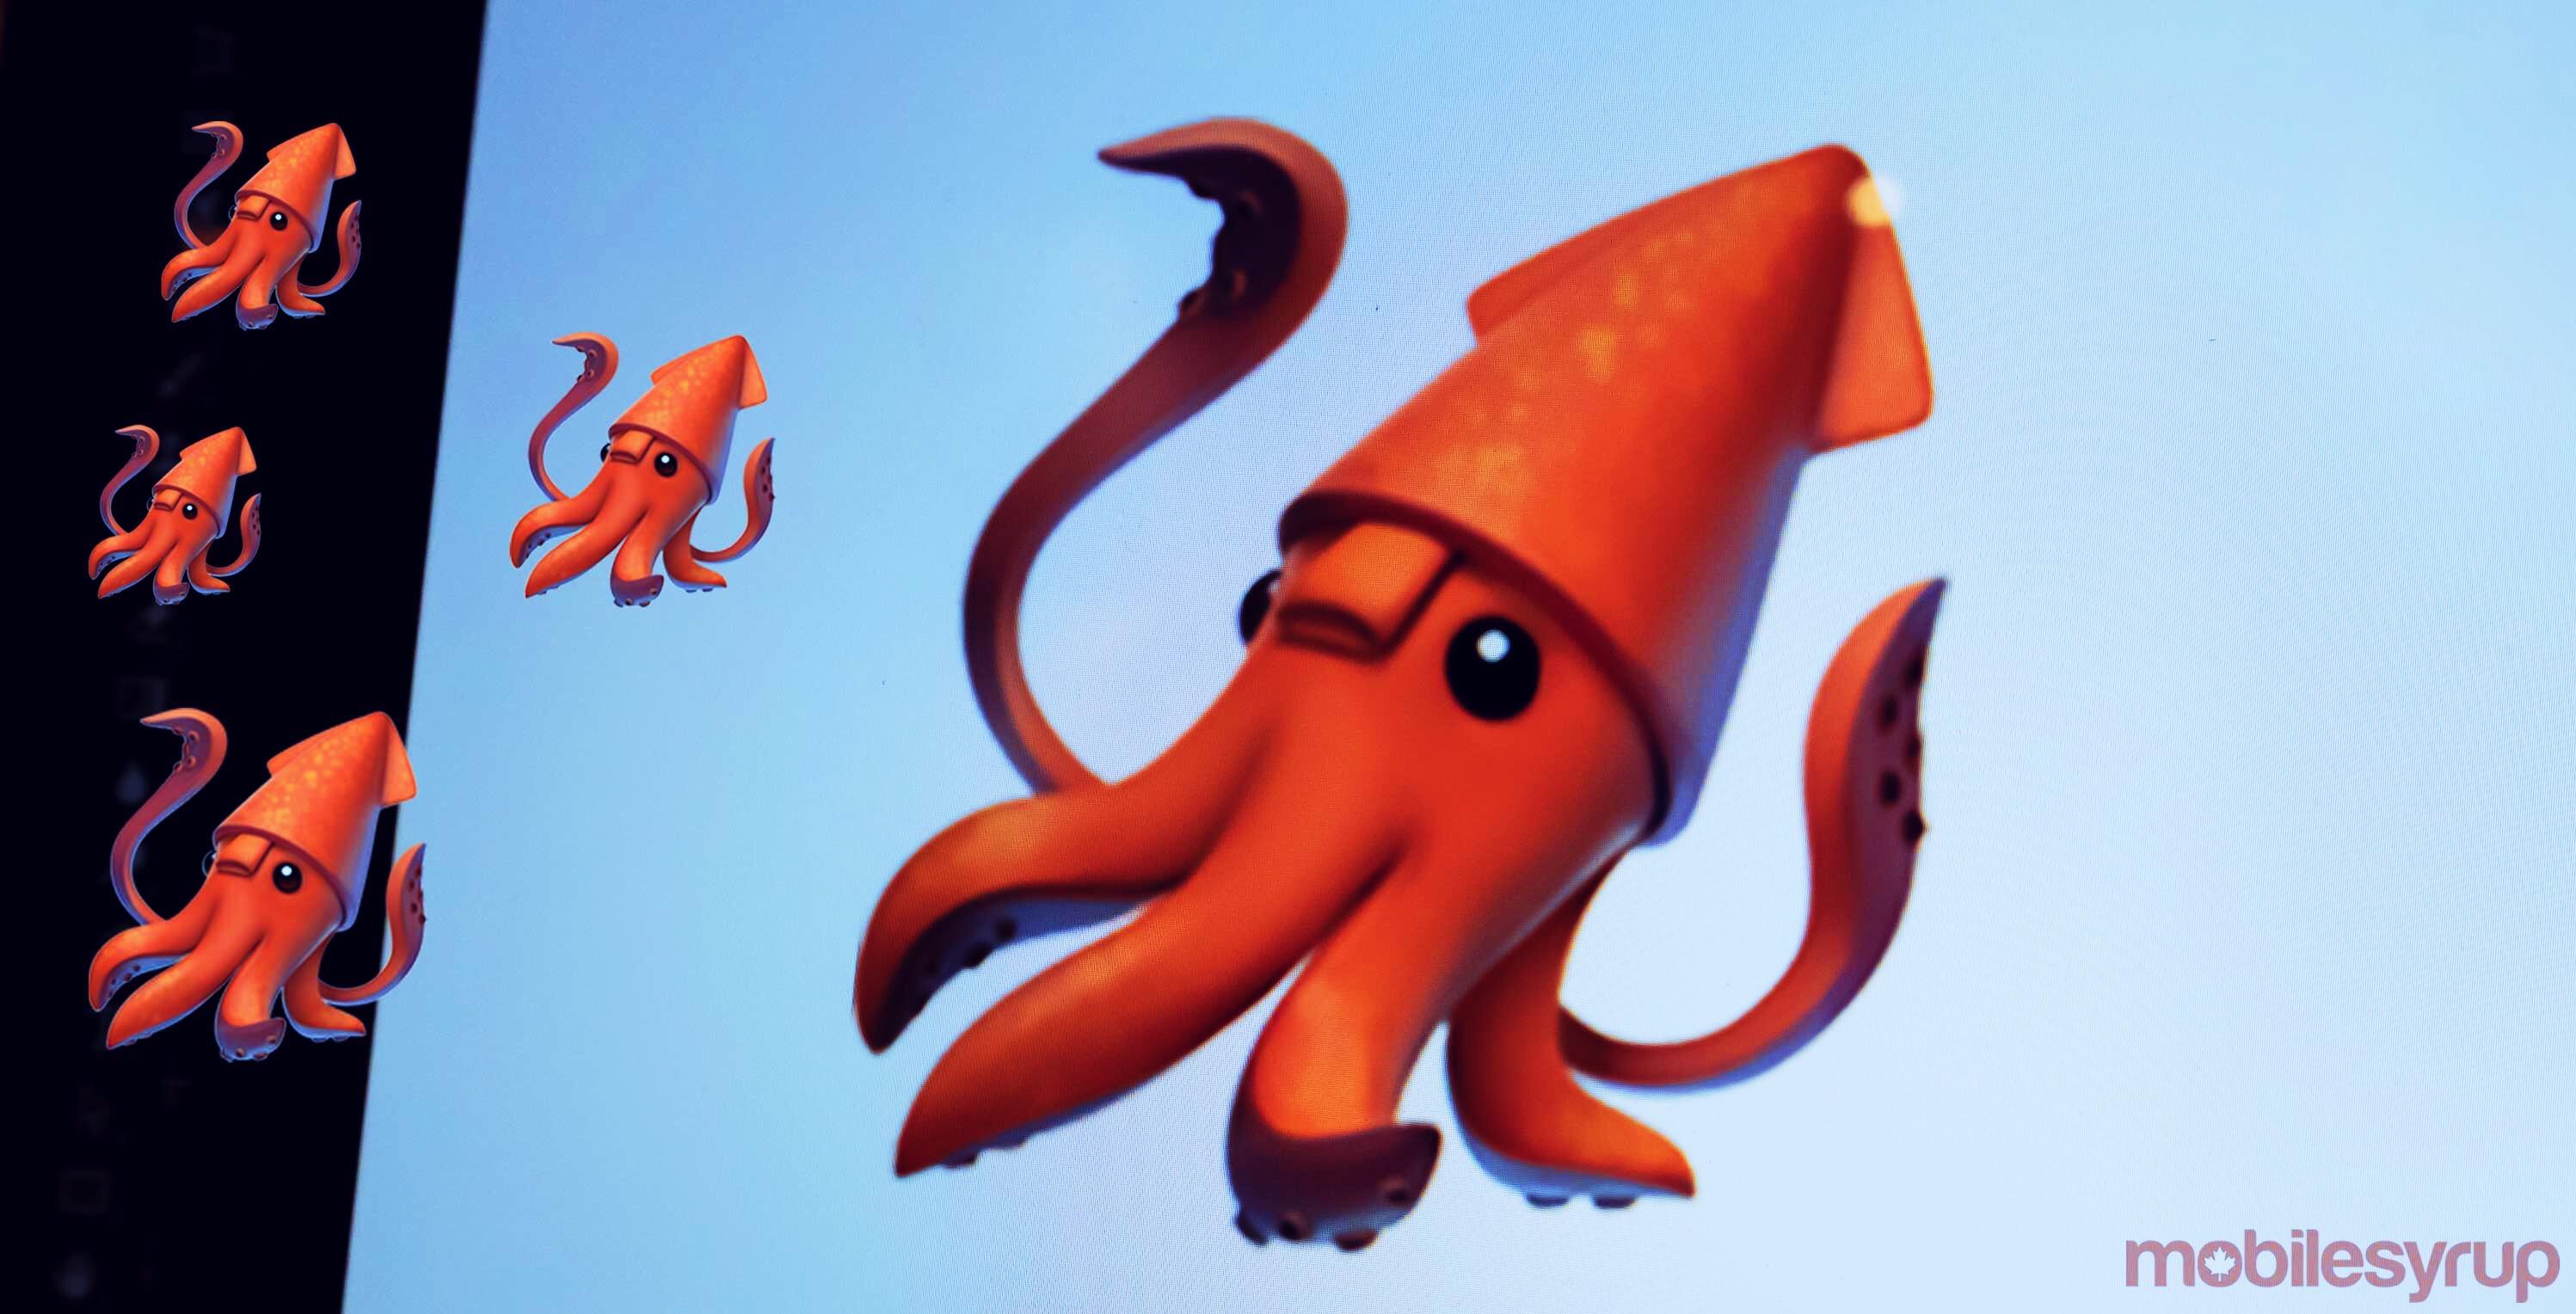 Apple's Squid emoji isanatomically incorrect and a U.S. aquarium wants it changed